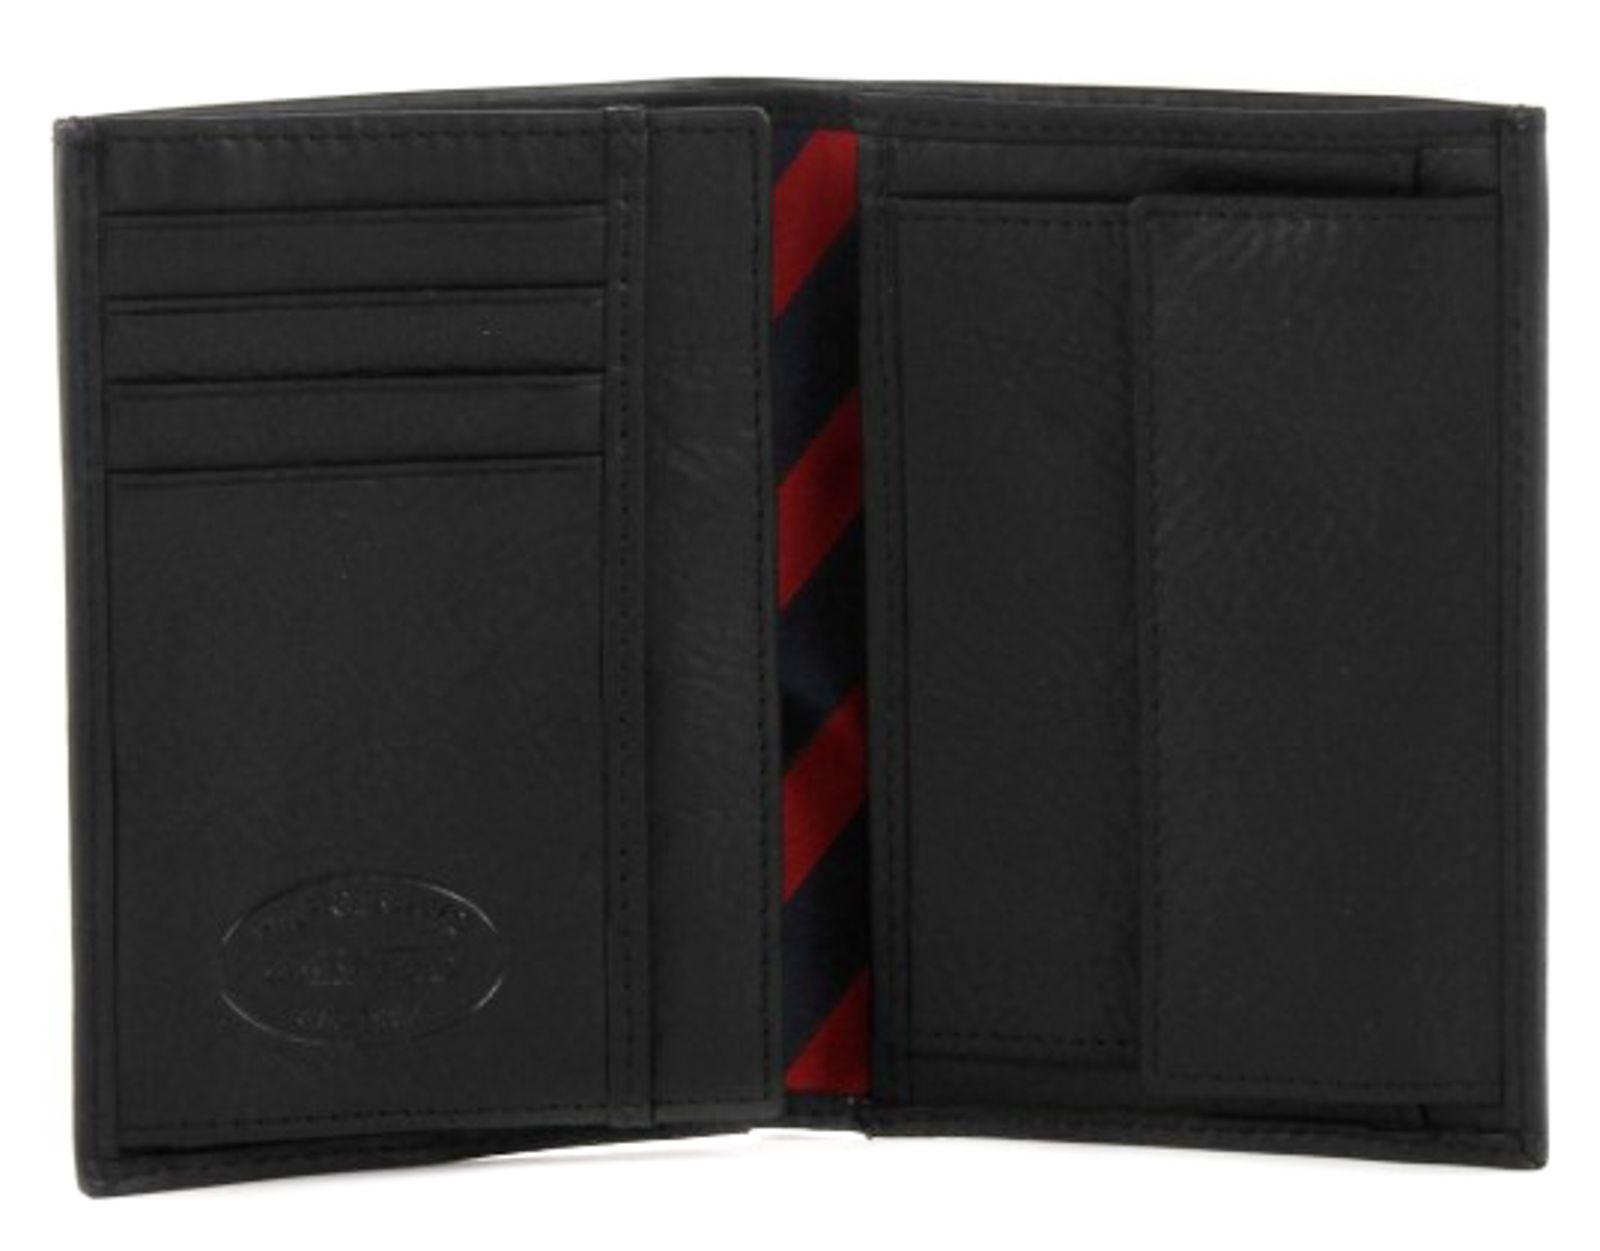 TOMMY HILFIGER Johnson N / S Wallet W / Coin Pocket Black